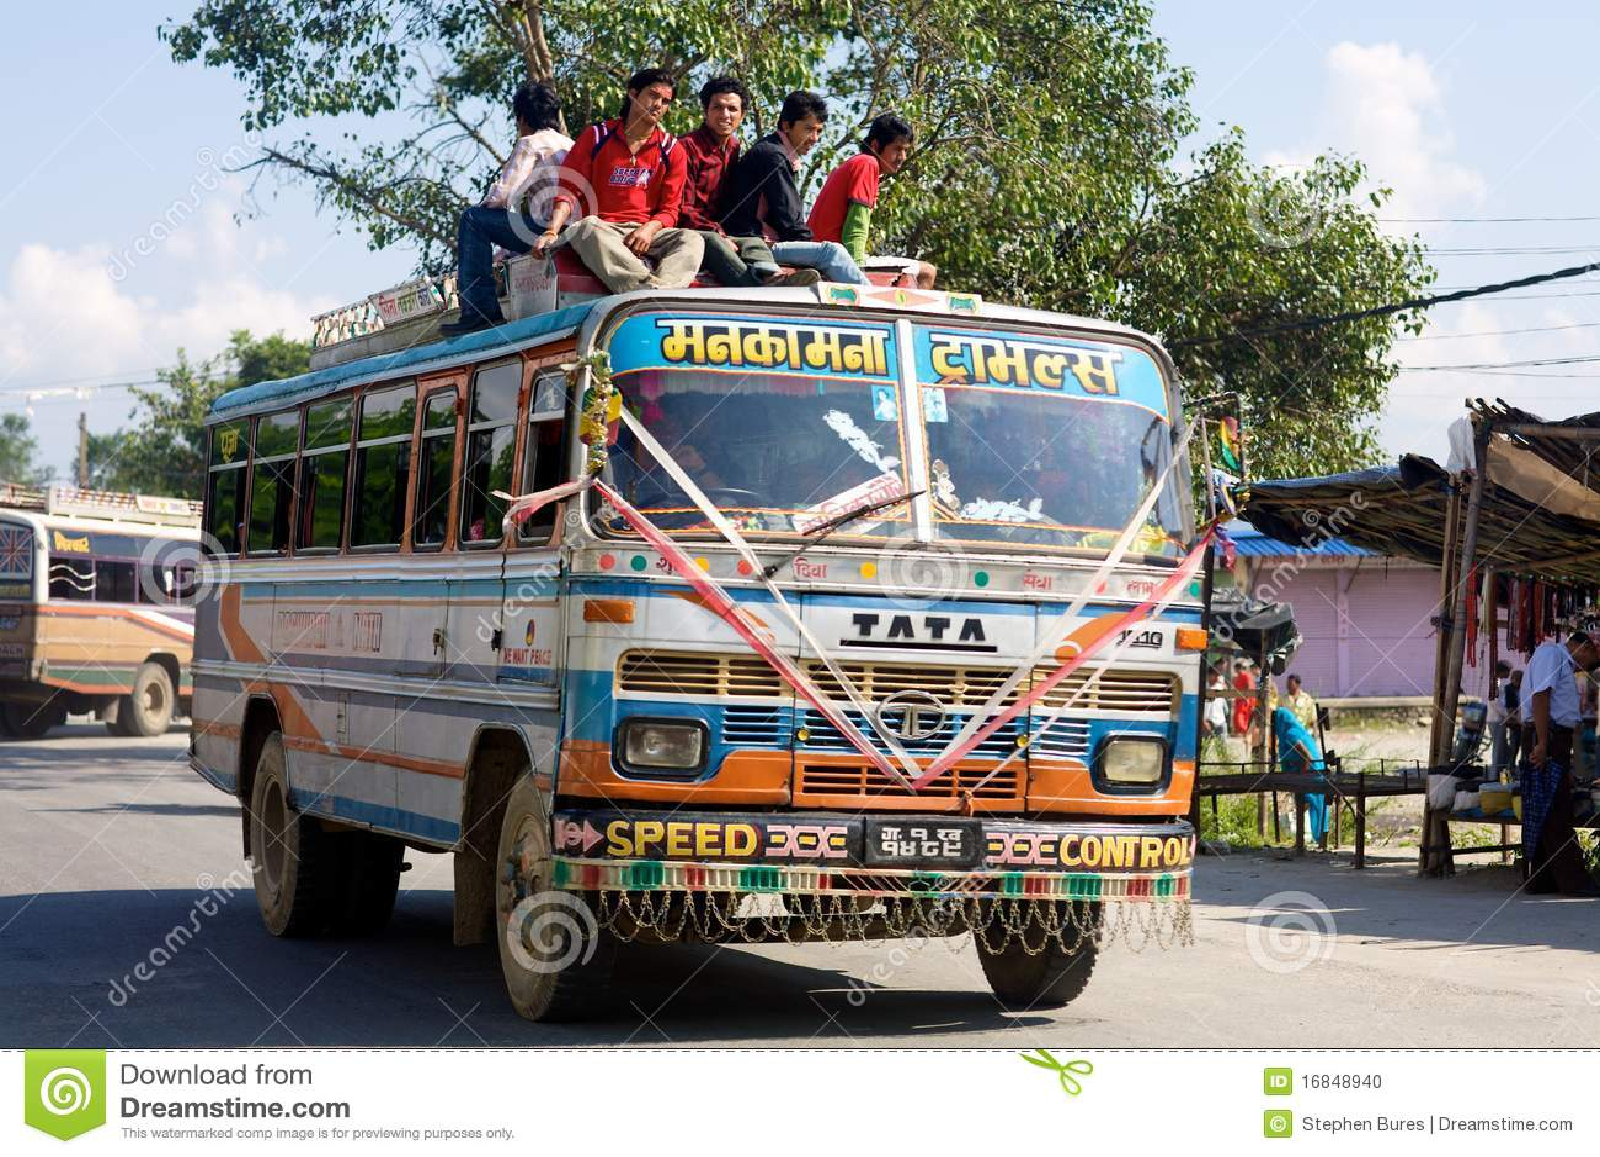 Kathmandu To Pokhara Bus Travel Time